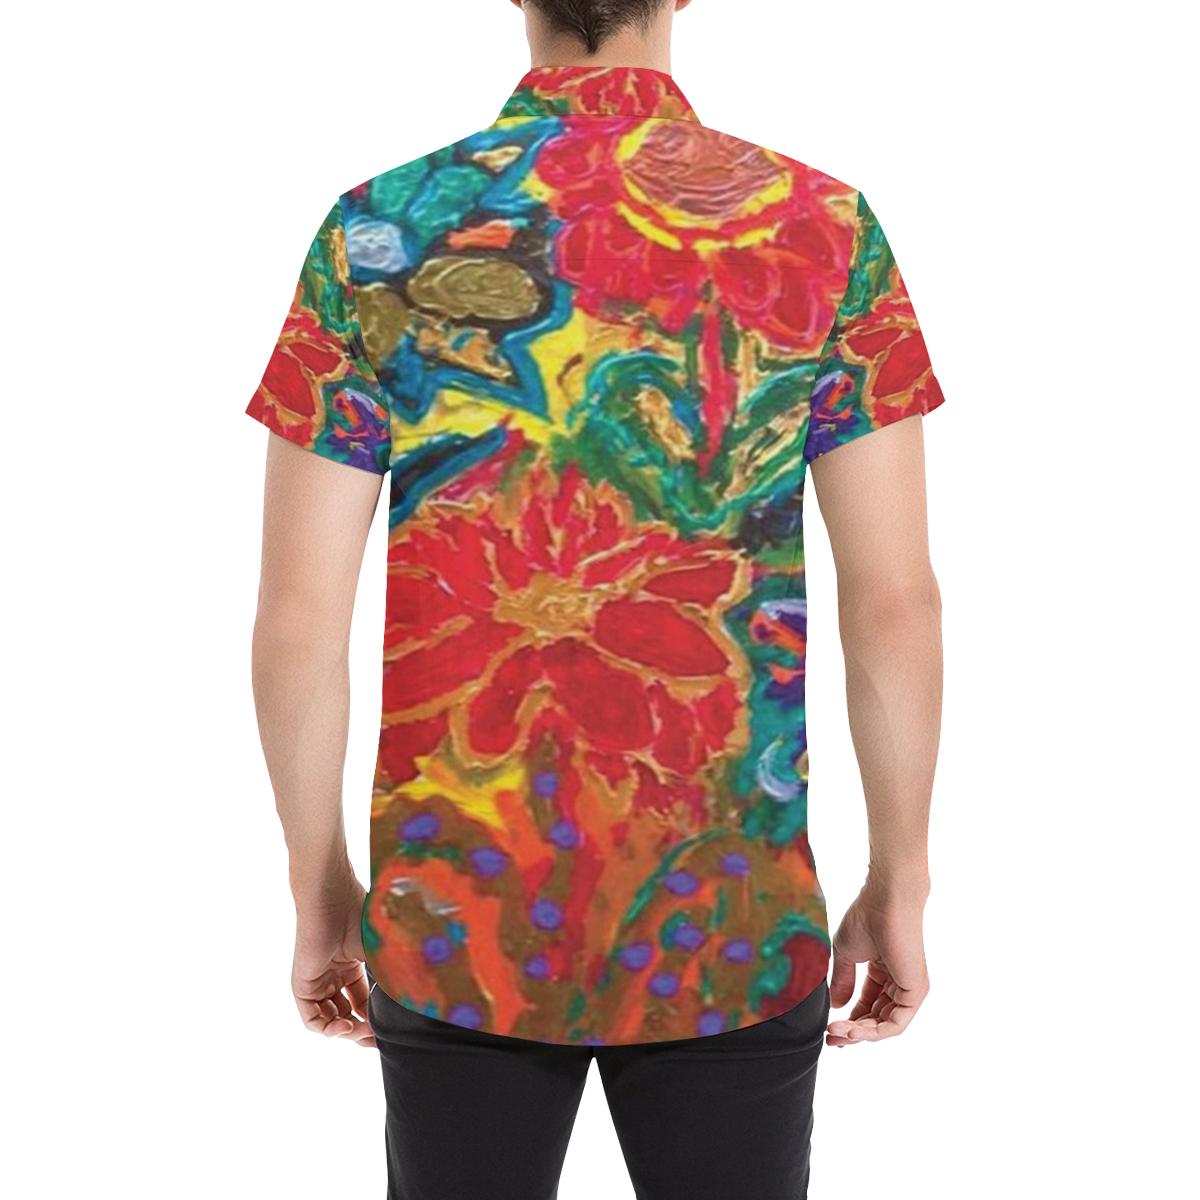 HAPPY SHIRT Men's All Over Print Short Sleeve Shirt (Model T53)